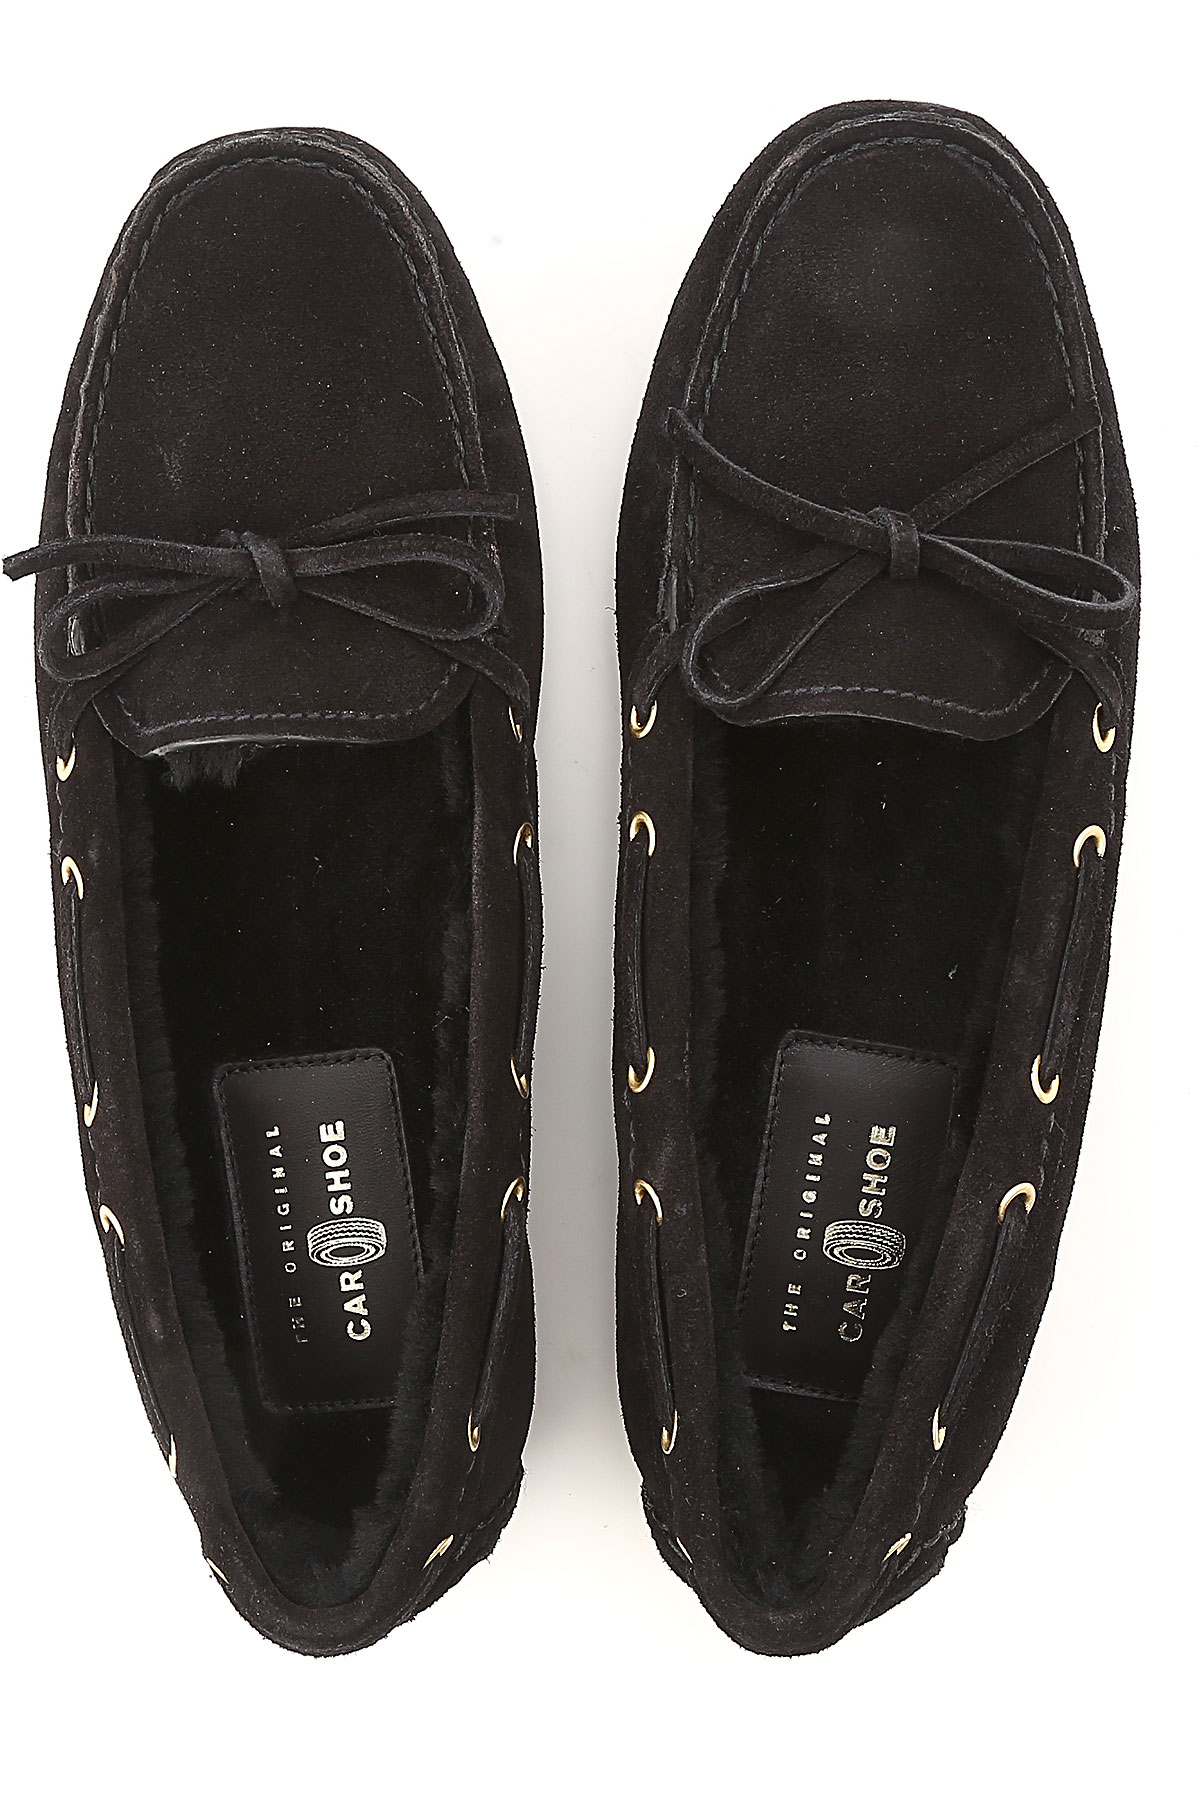 verano Zapatos Car Negro 2019 Shoe Primavera nbsp; Mujer Para fwTFq7